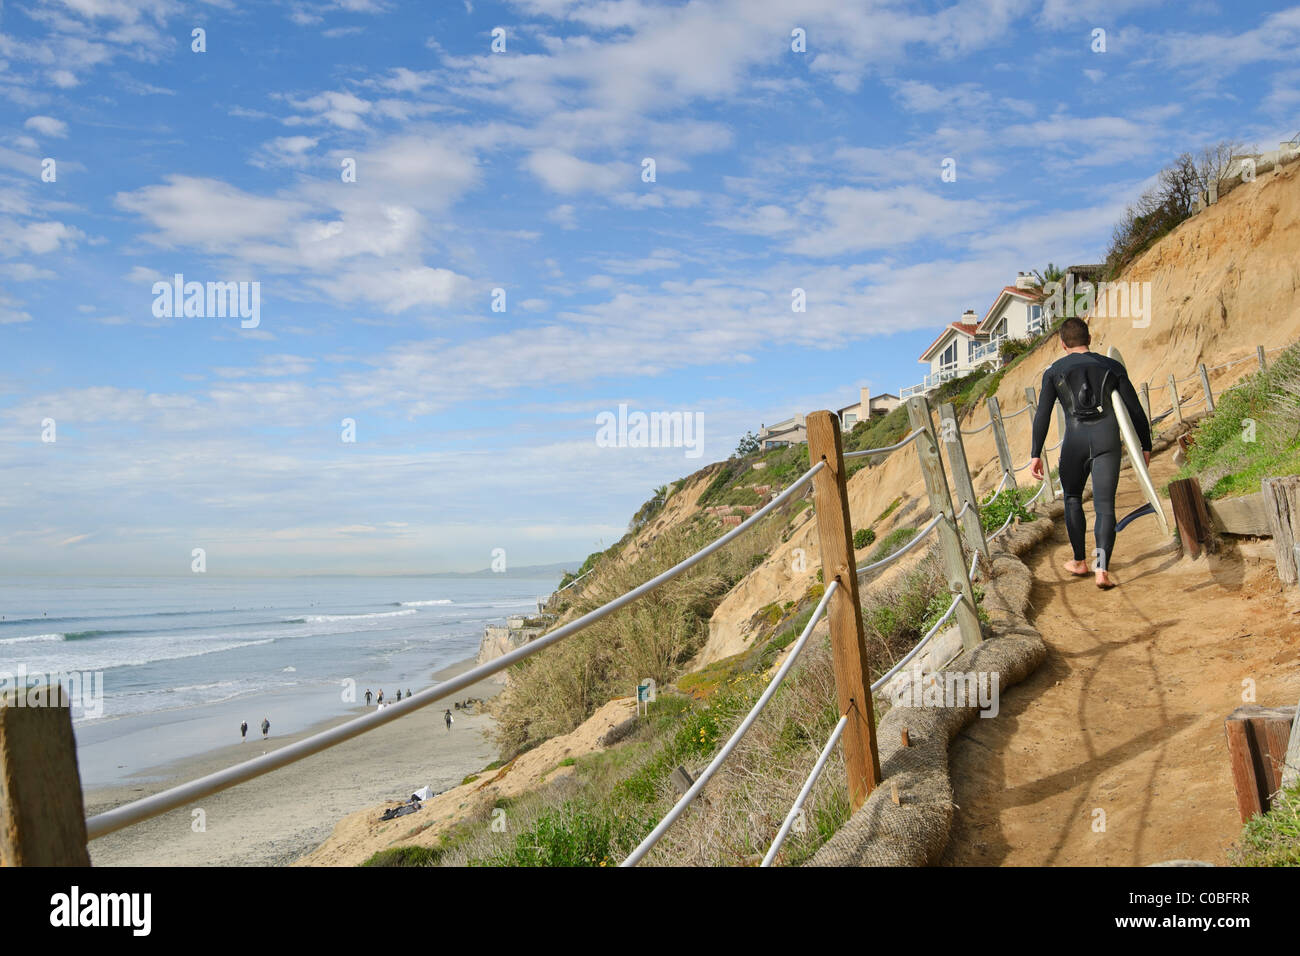 Surfers climbing a coastal bluff trail at Beacons Beach in Encinitas, California. - Stock Image